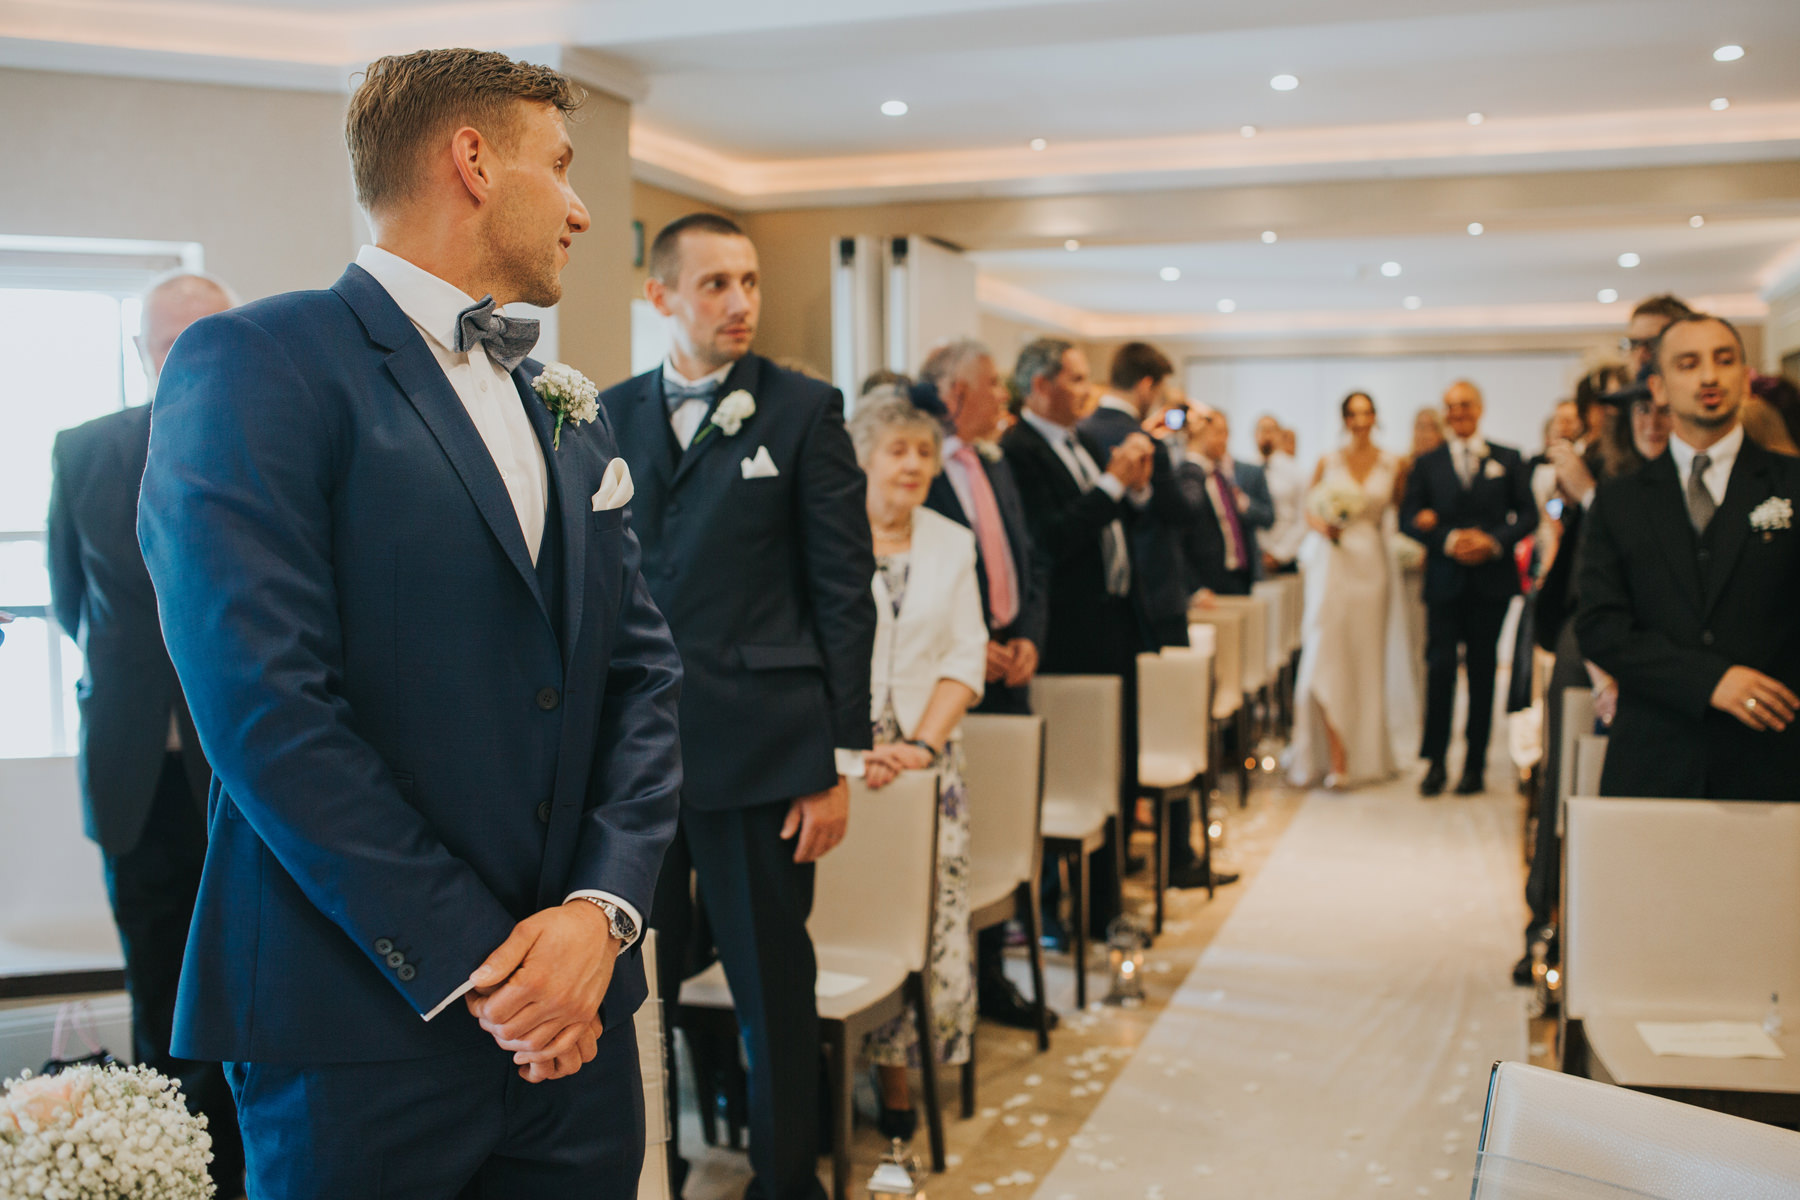 The Bingham Wedding Photographer London--groom waiting bride coming down aisle-CRL-128.jpg